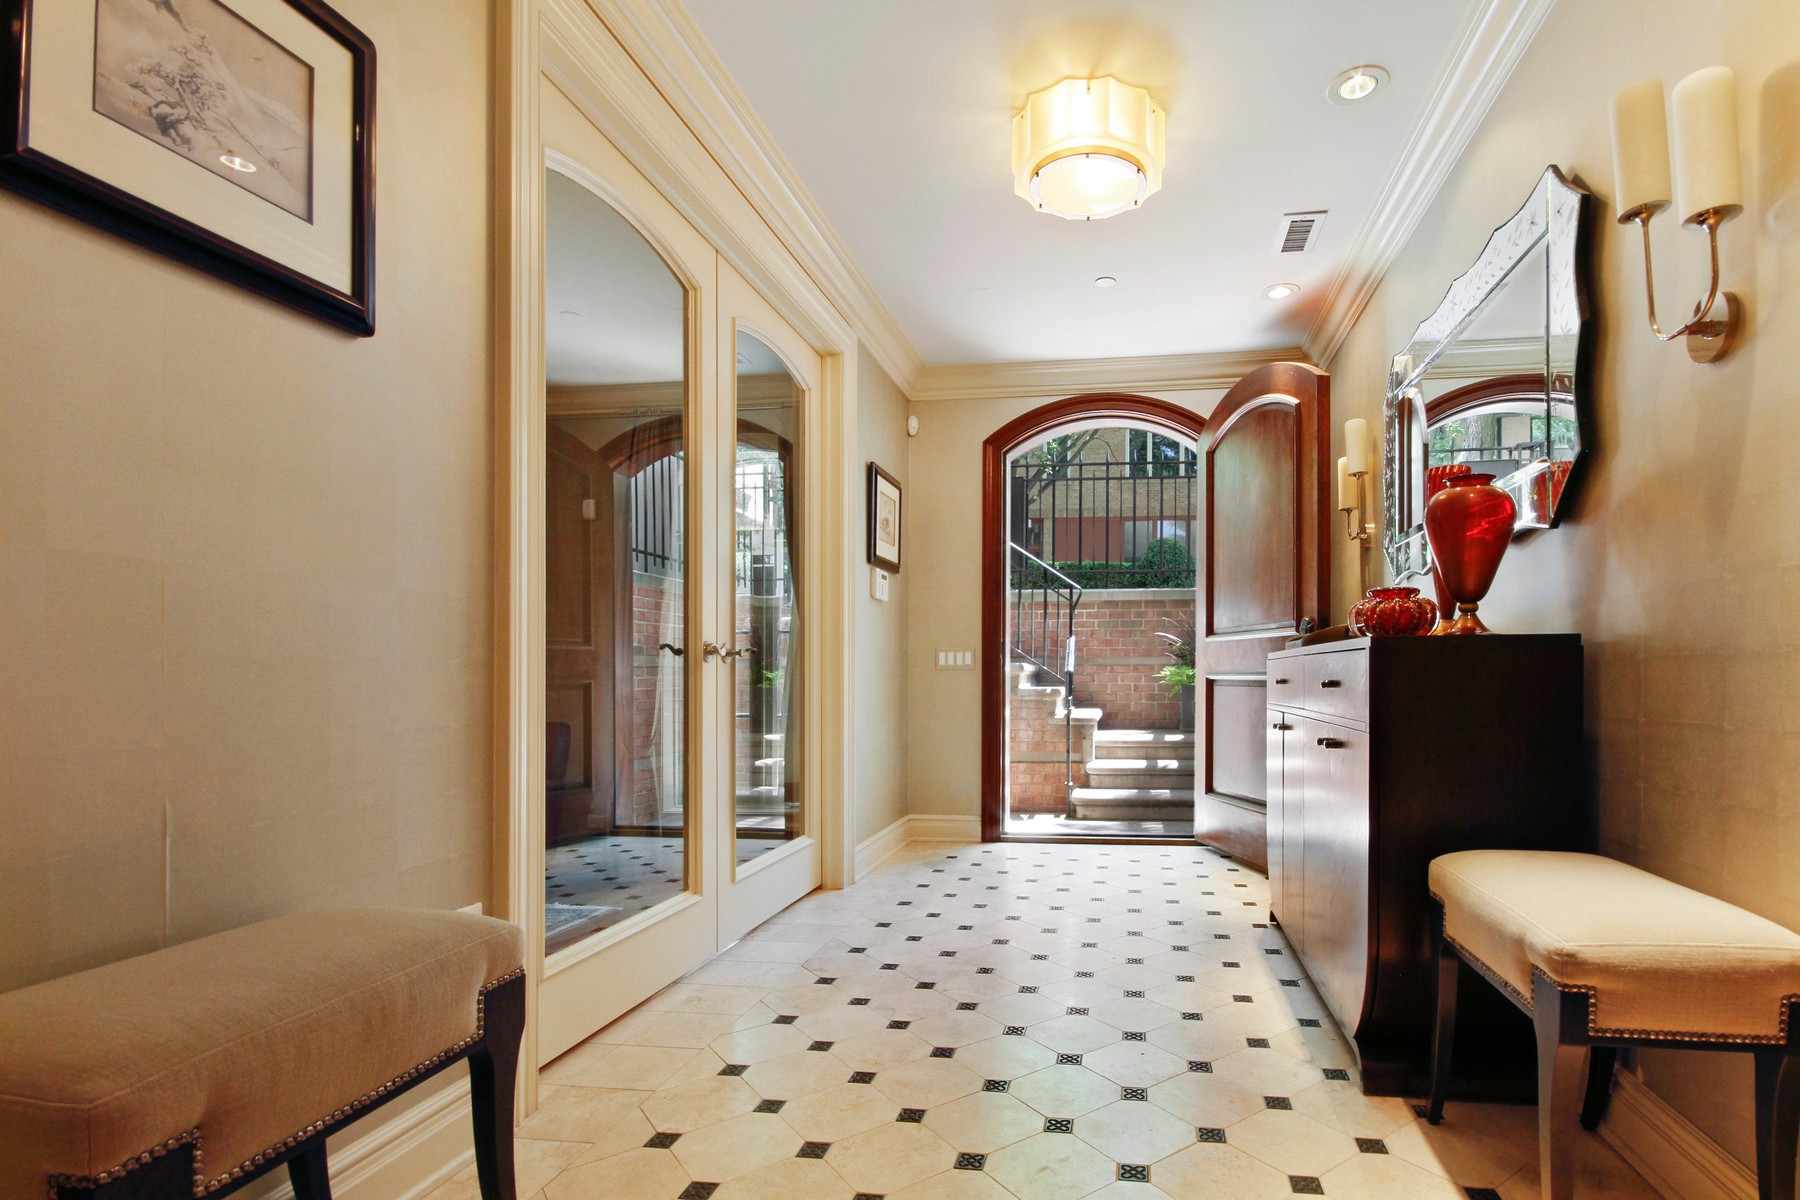 獨棟家庭住宅 為 出售 在 Elegant Custom-Built Lincoln Park Home 1744 N Cleveland Avenue, Chicago, 伊利諾斯州, 60614 美國